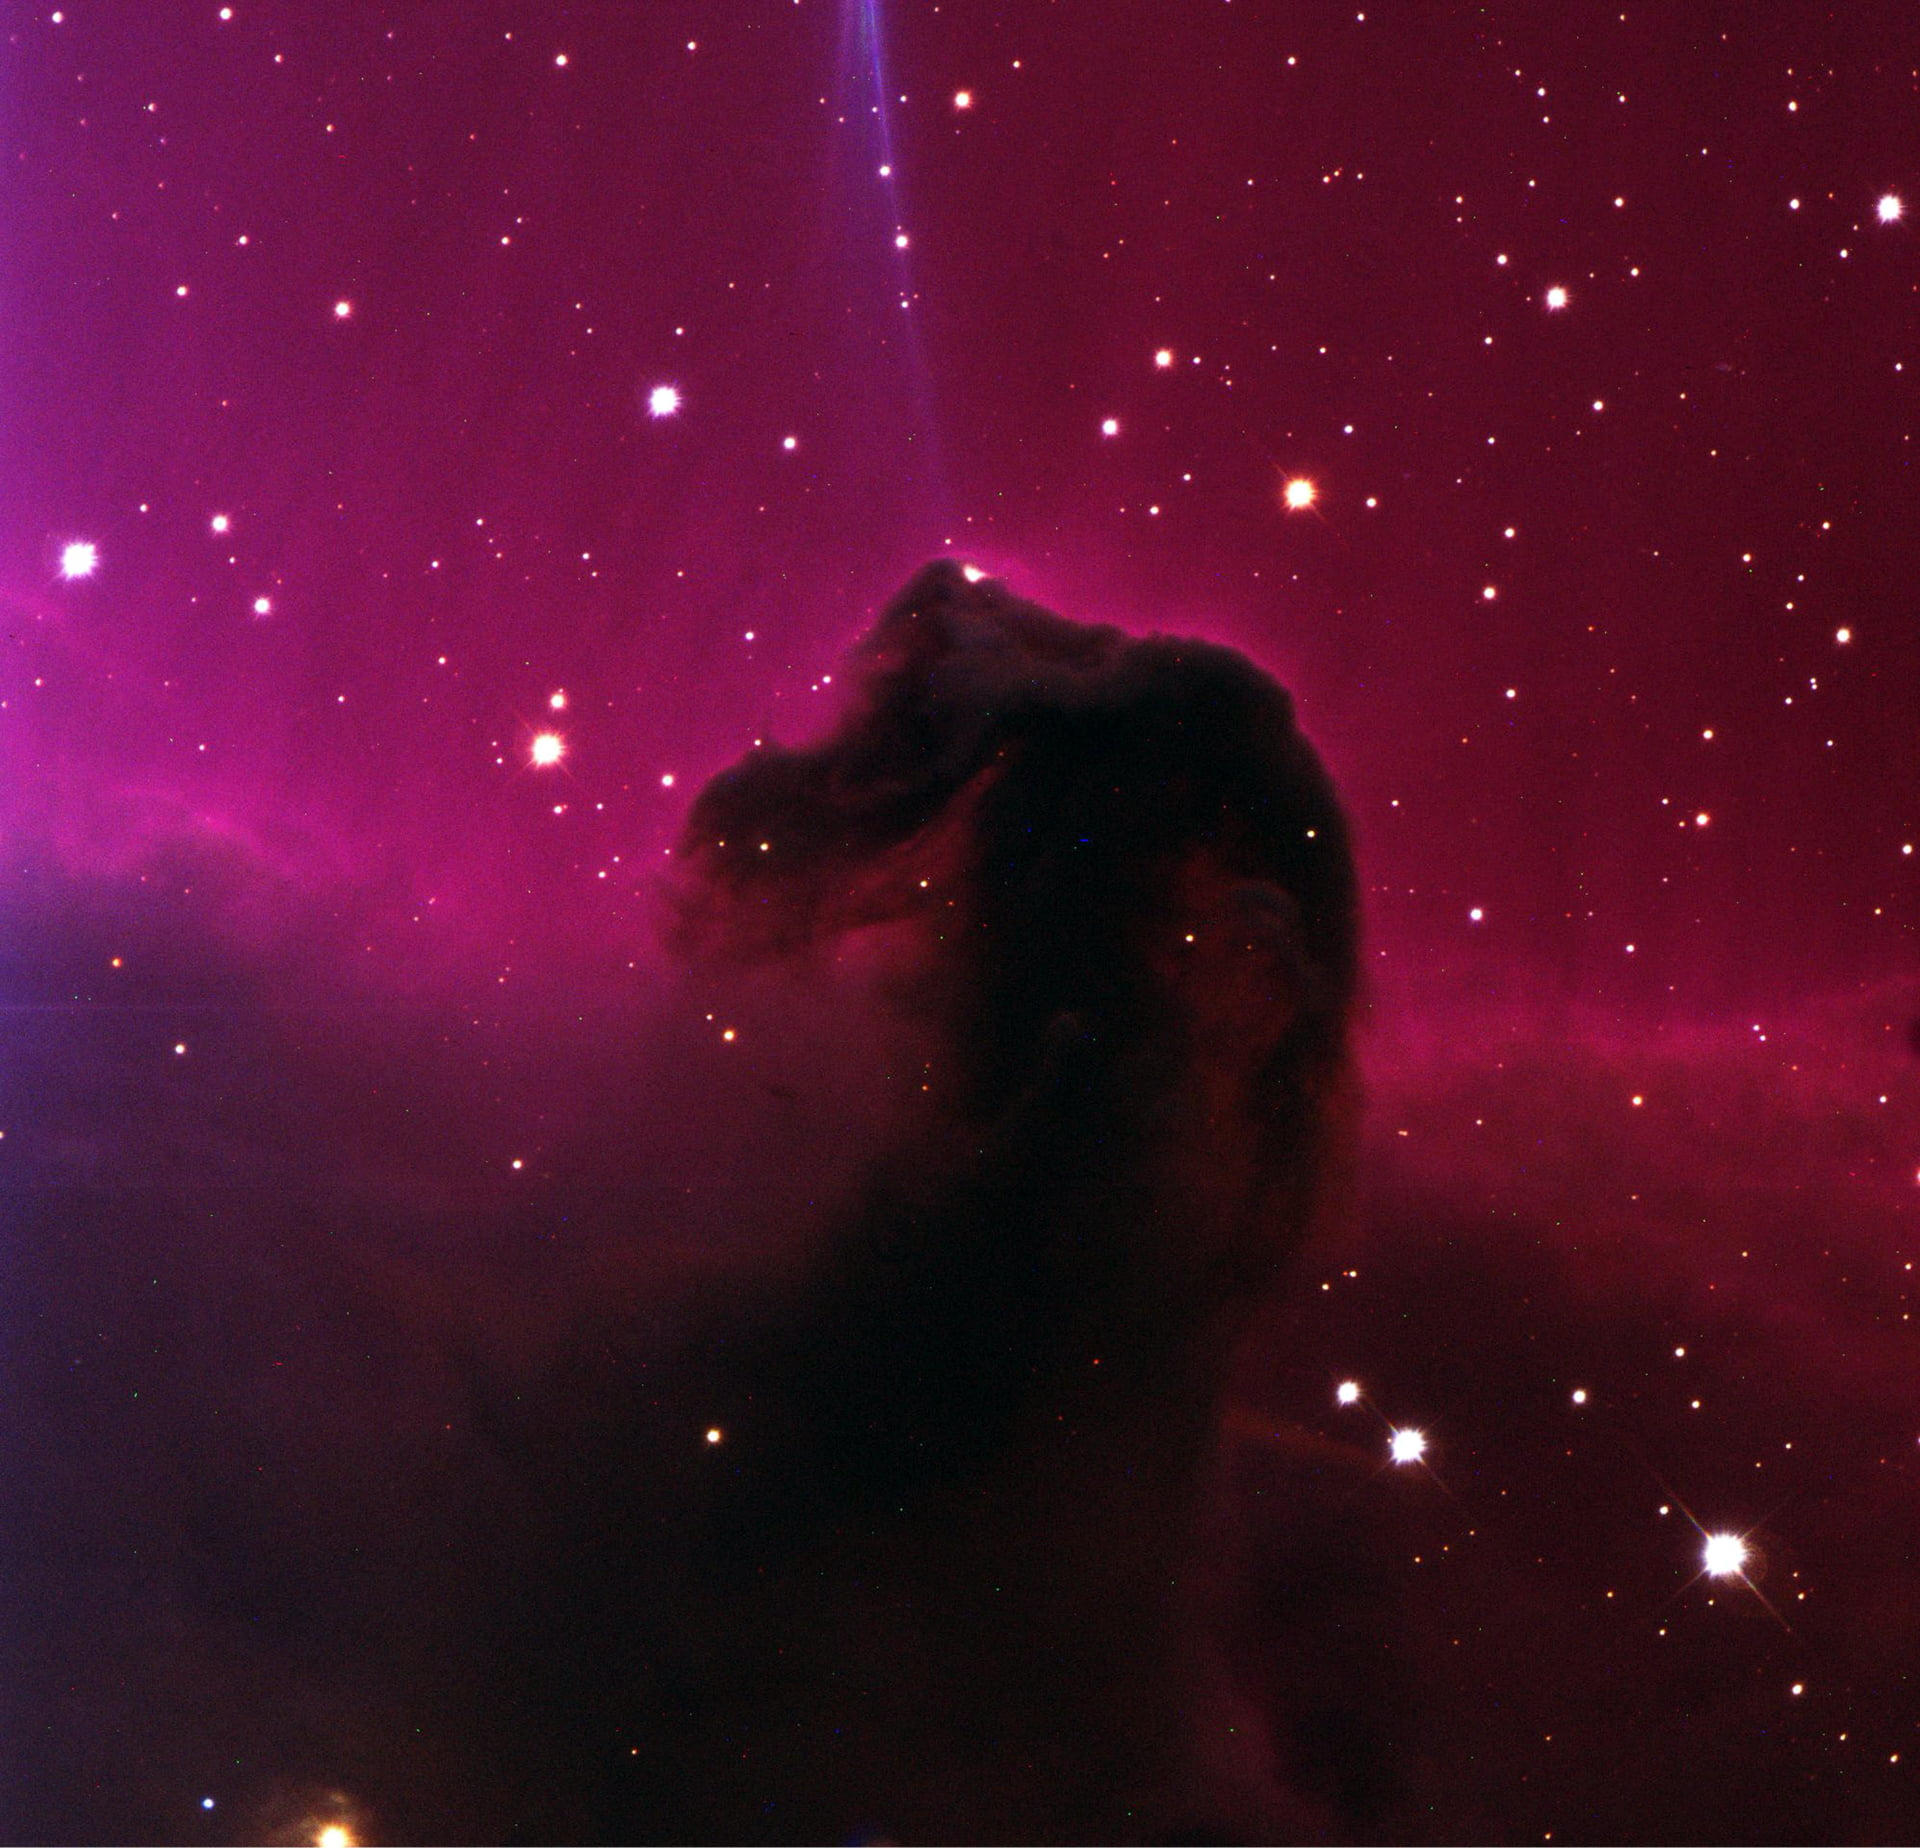 Dark nebula Barnard 33, the Horsehead Nebula